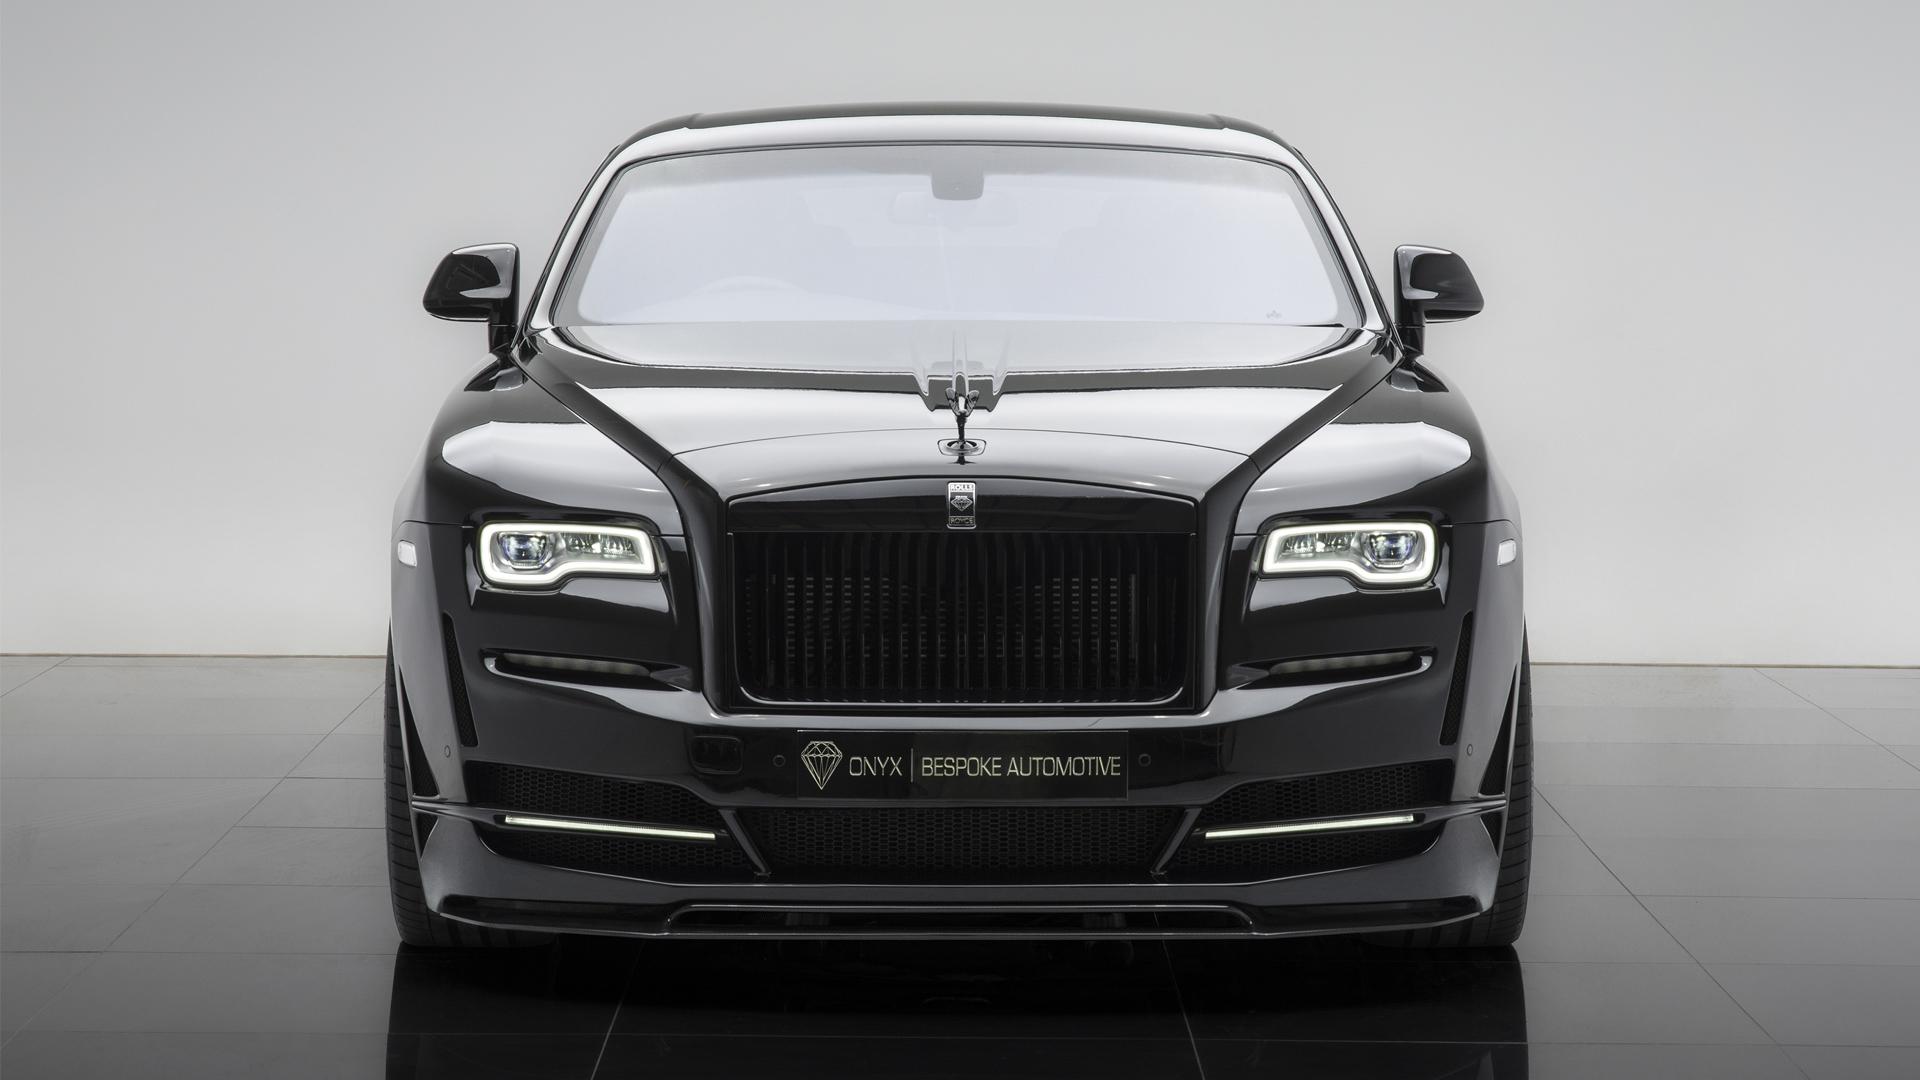 Onyx body kit for ROLLS ROYCE WRAITH carbon fiber